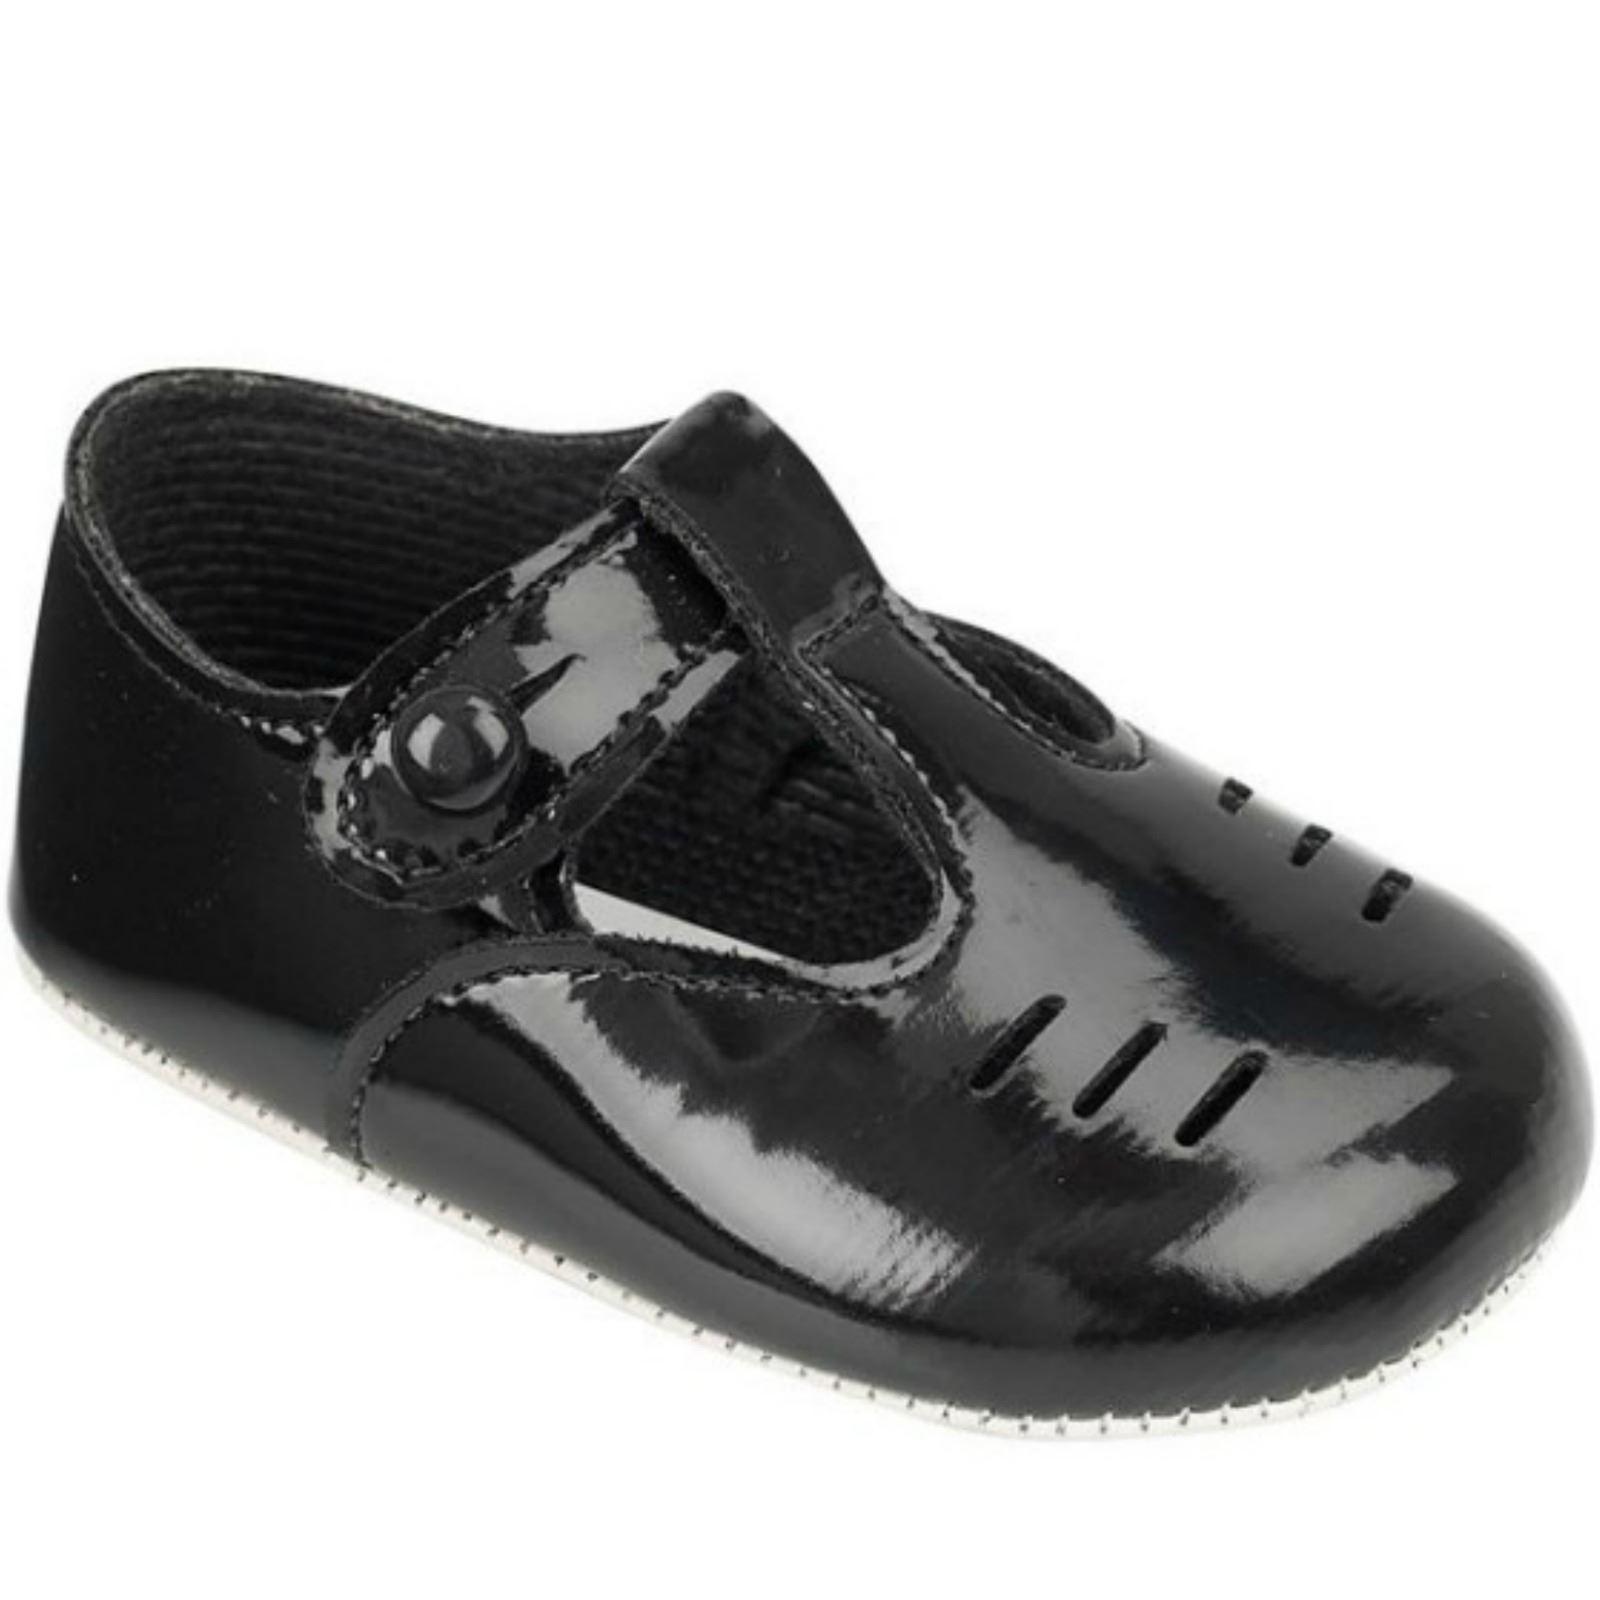 Baby Boy s Pram Shoes Prewalkers Blue Black Ivory White